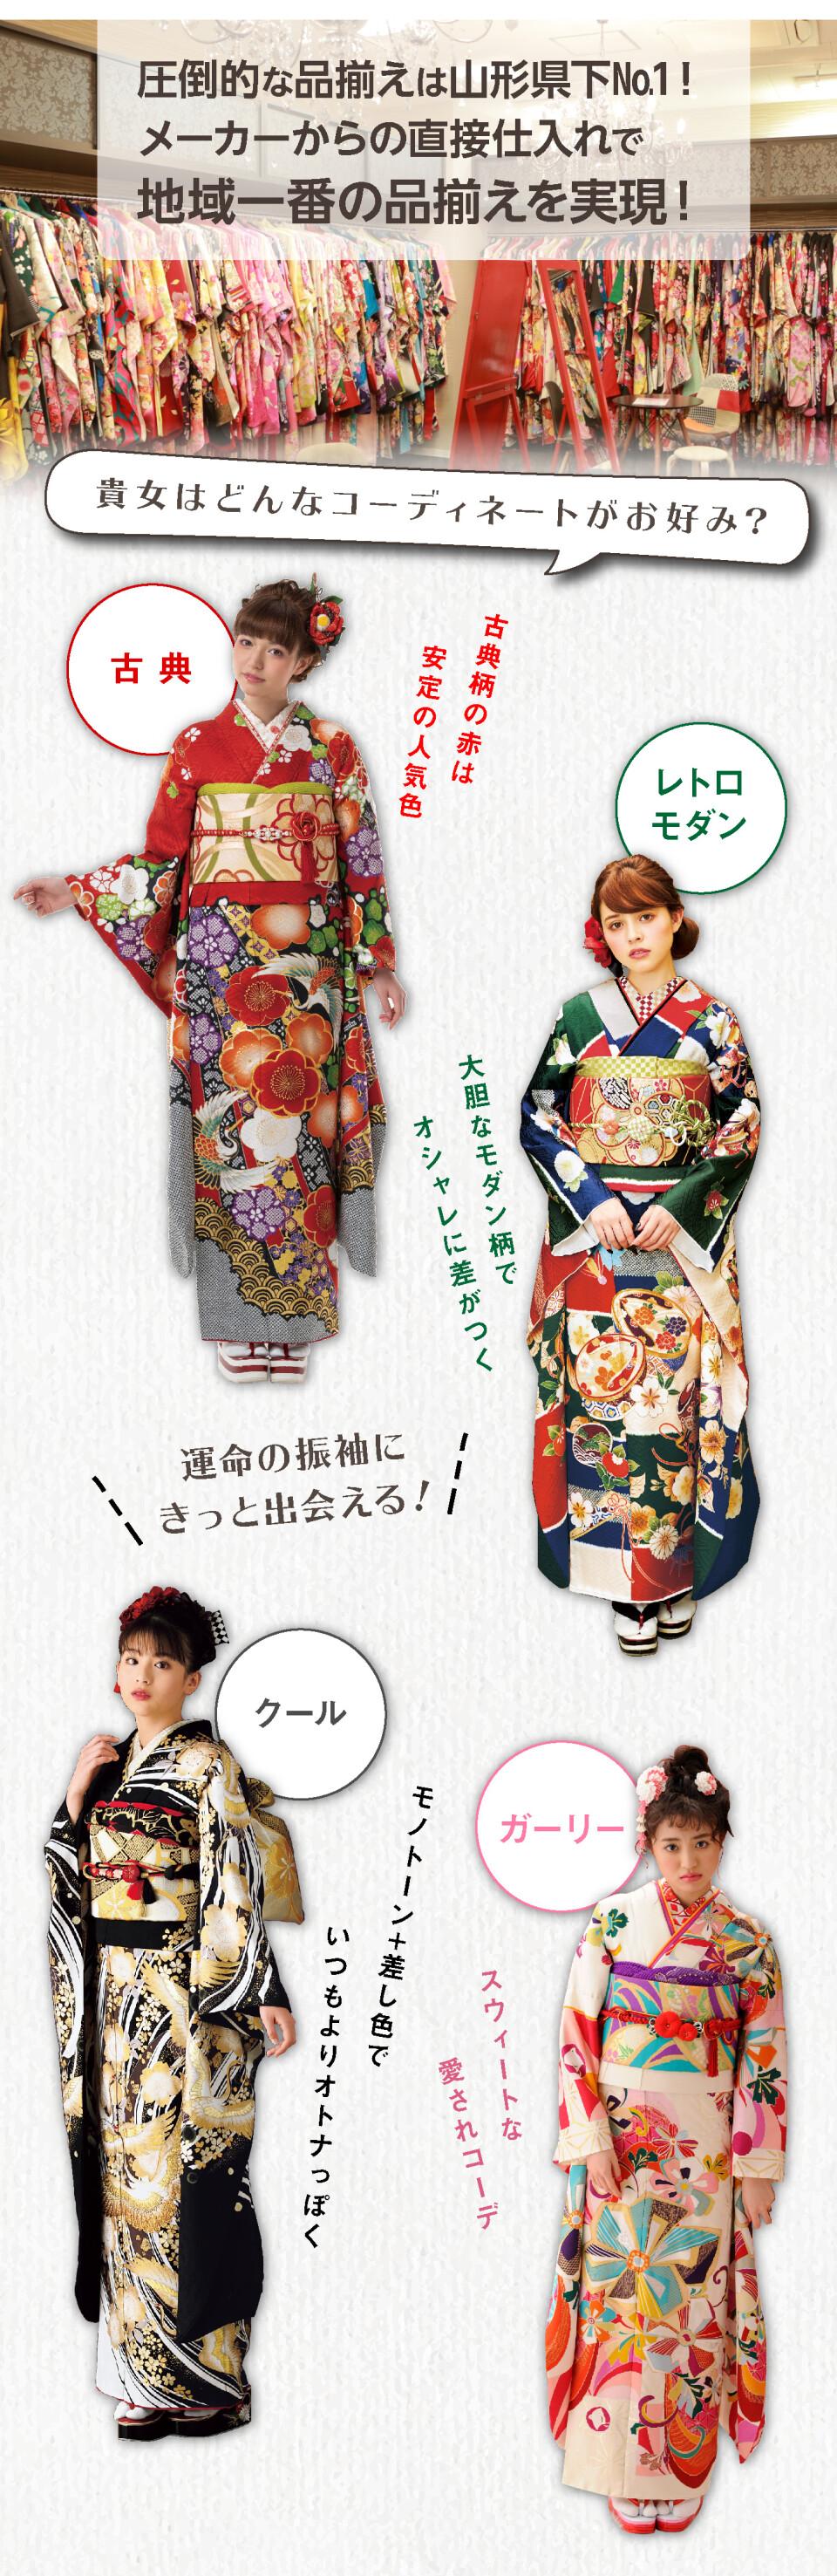 202008-profile_山形_2